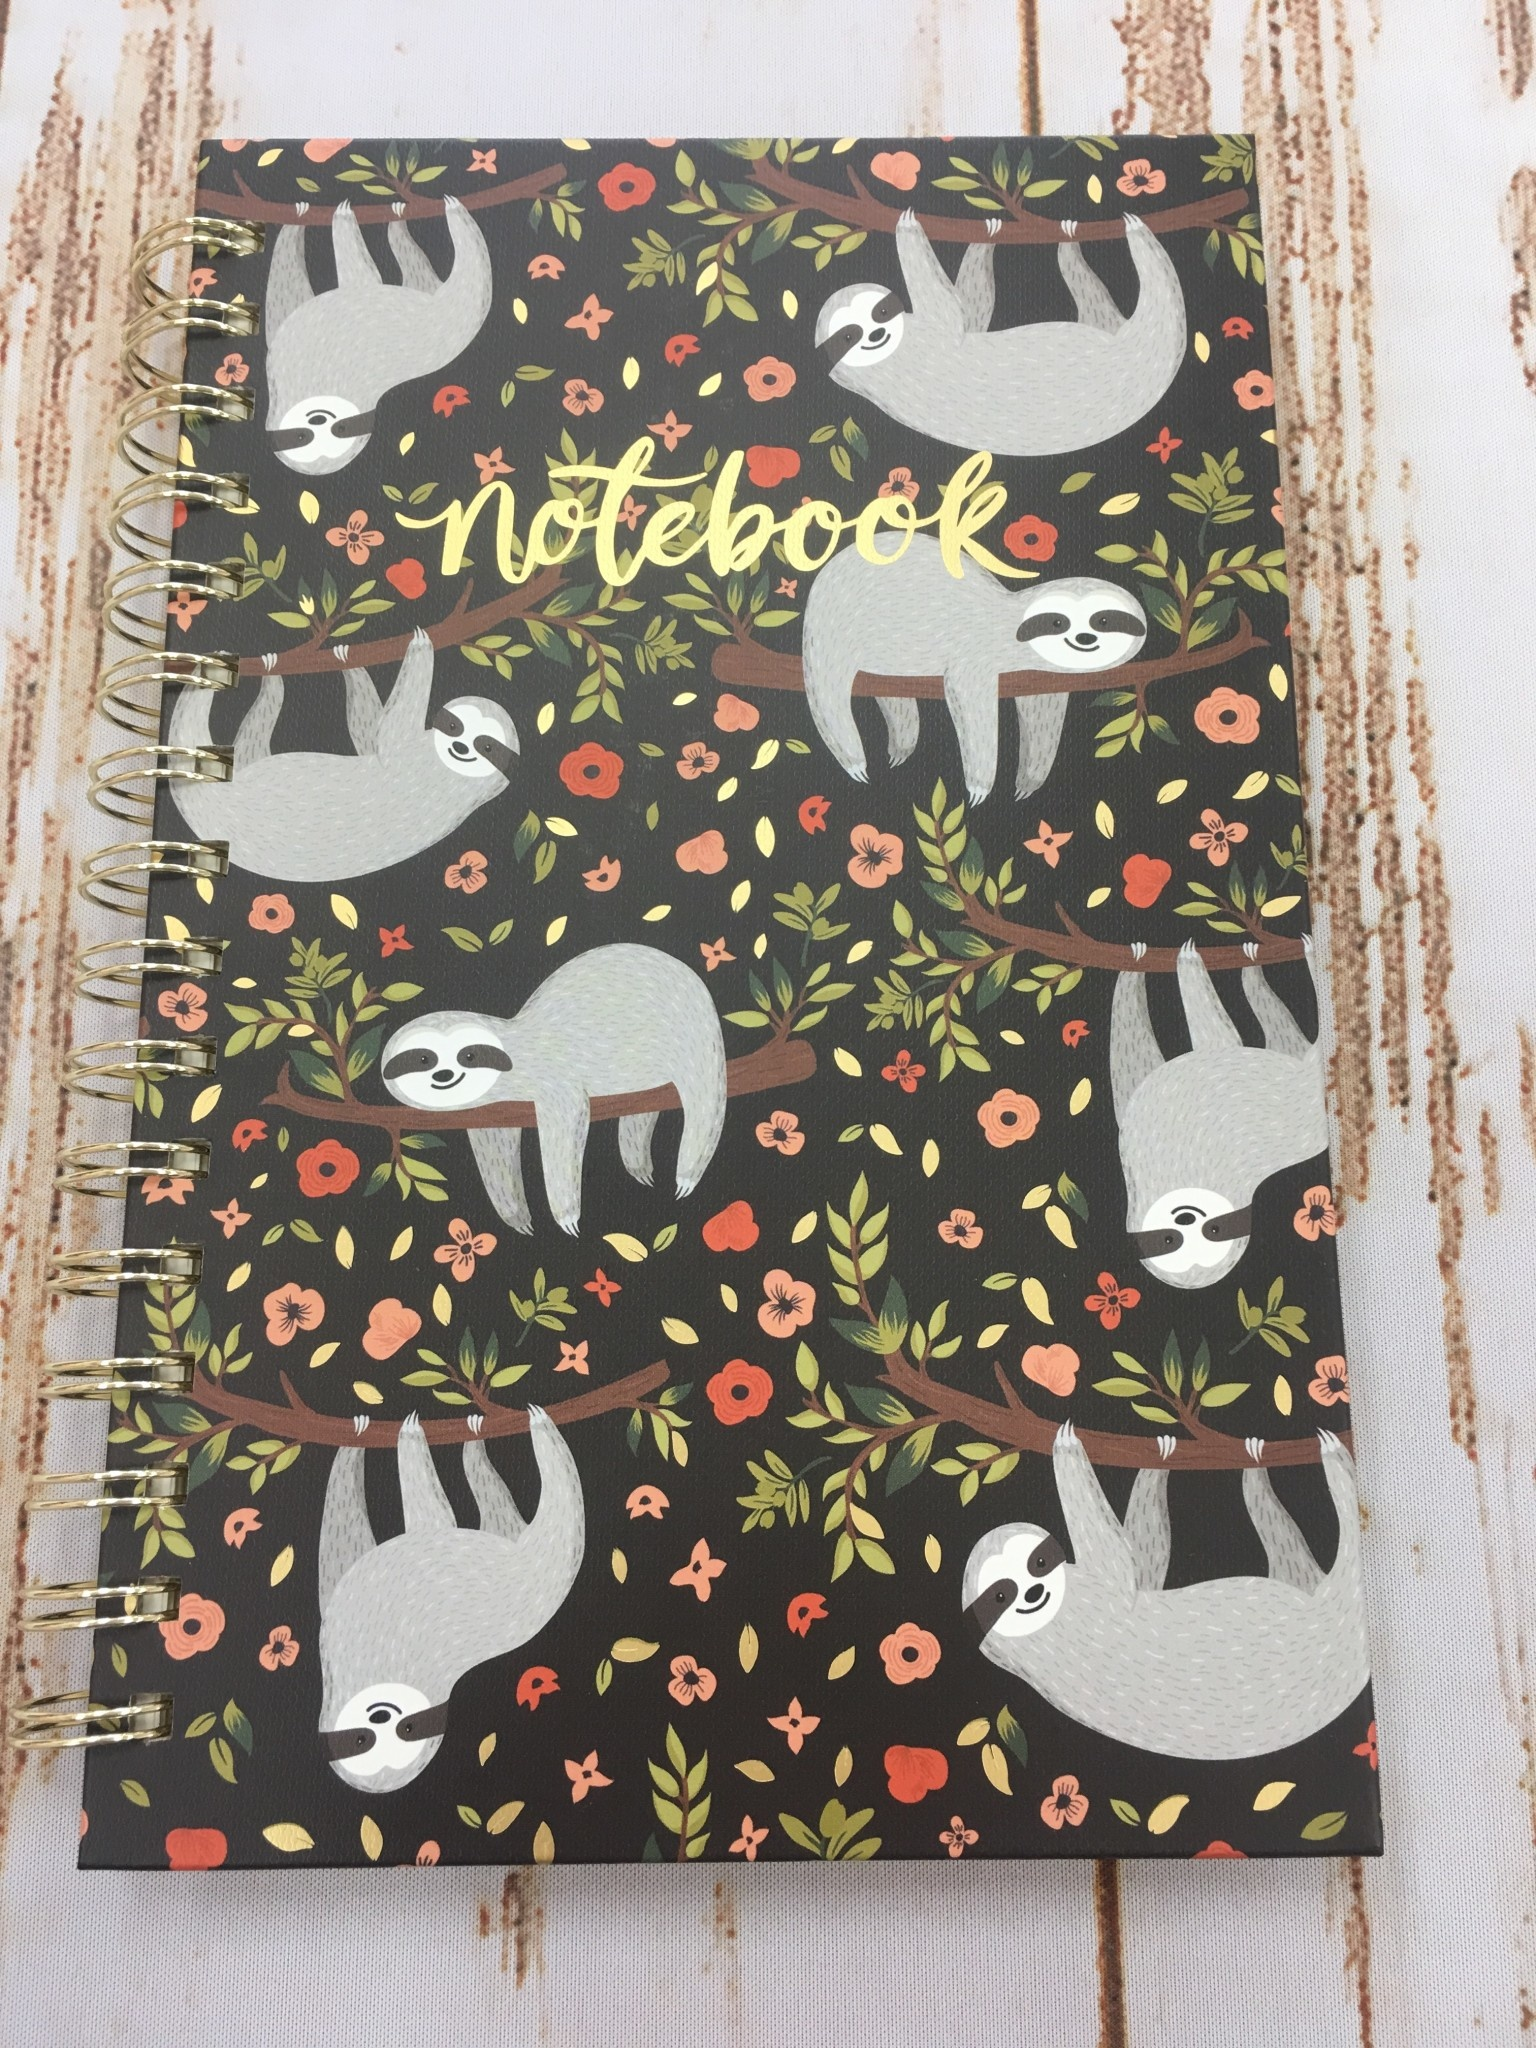 Studio Oh! Sloth Life Notebook